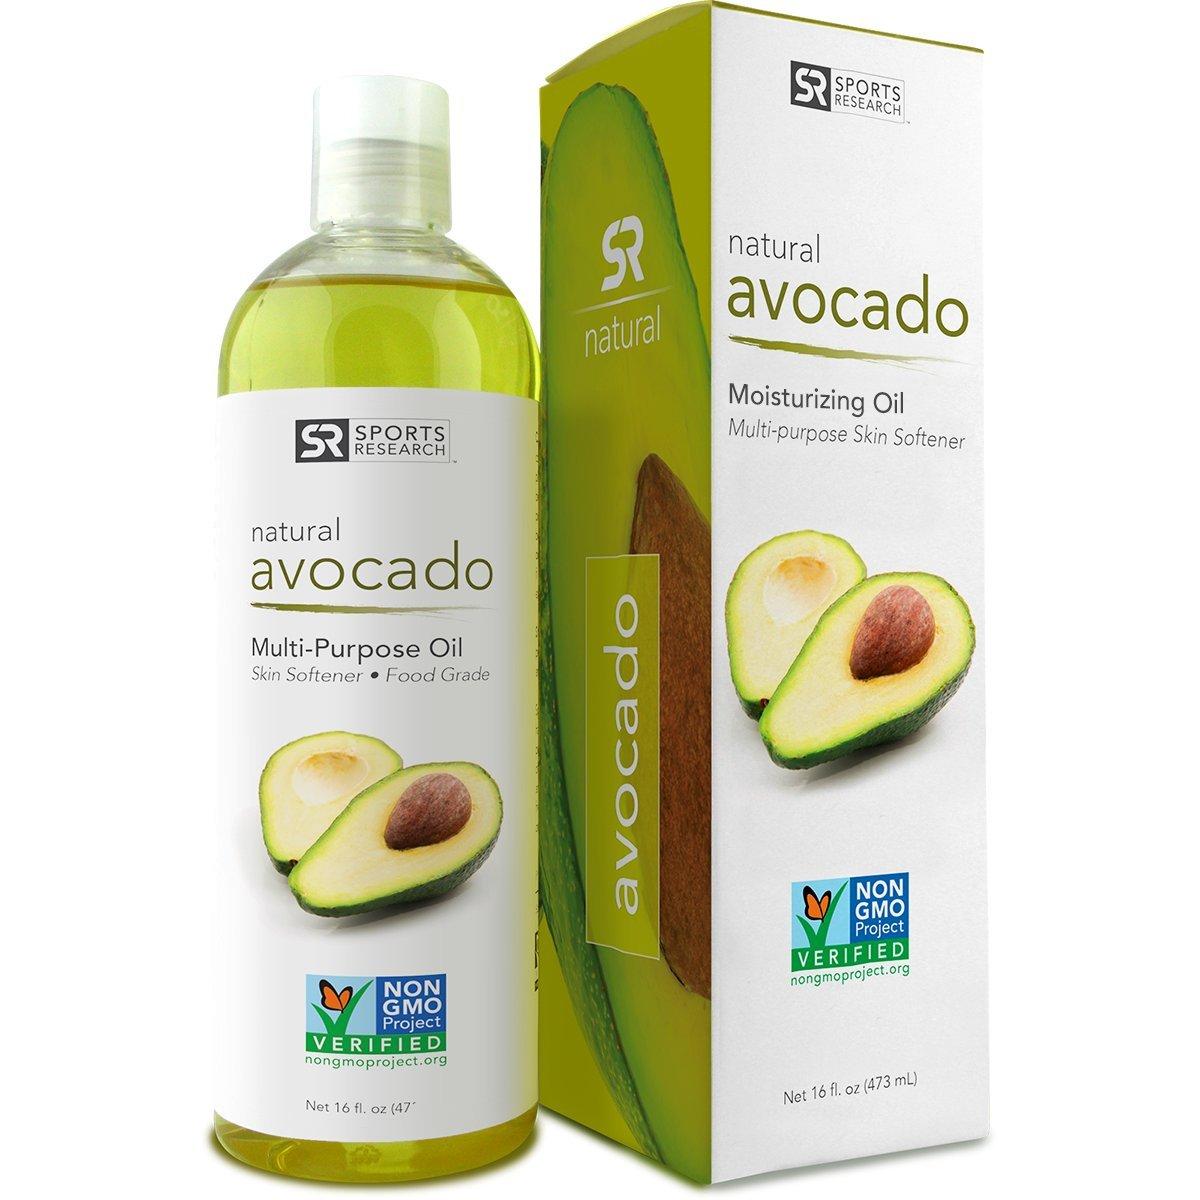 Pure Avocado Oil (16oz). 100% Natural, Food Grade and Non-GMO Verified. UV Resistant BPA free bottle - 100% Satisfaction Guarantee